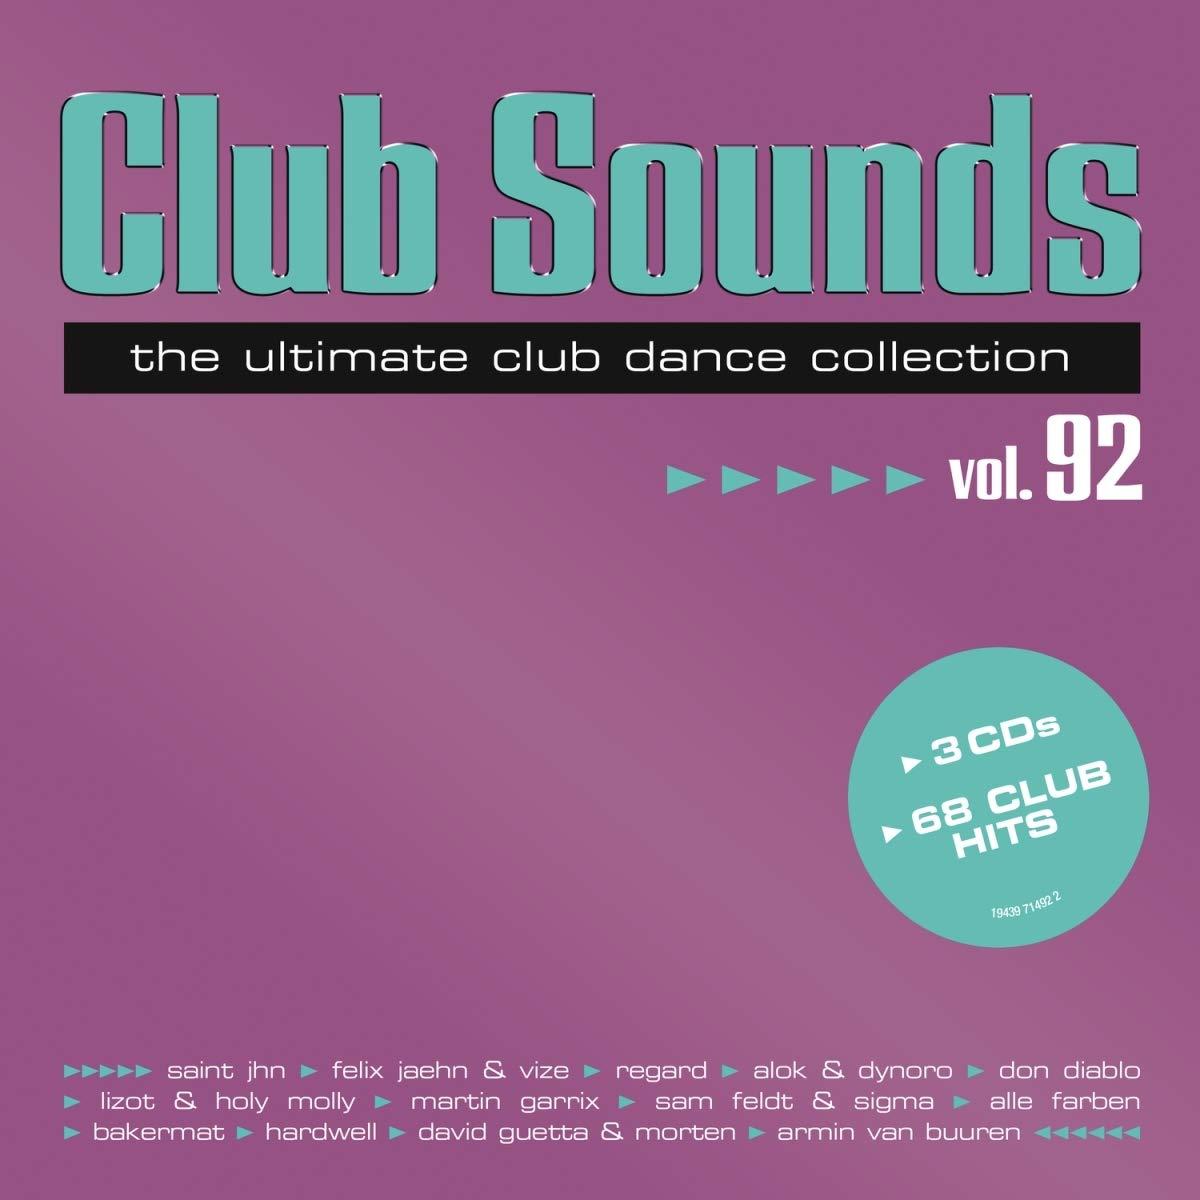 Club Sounds 92